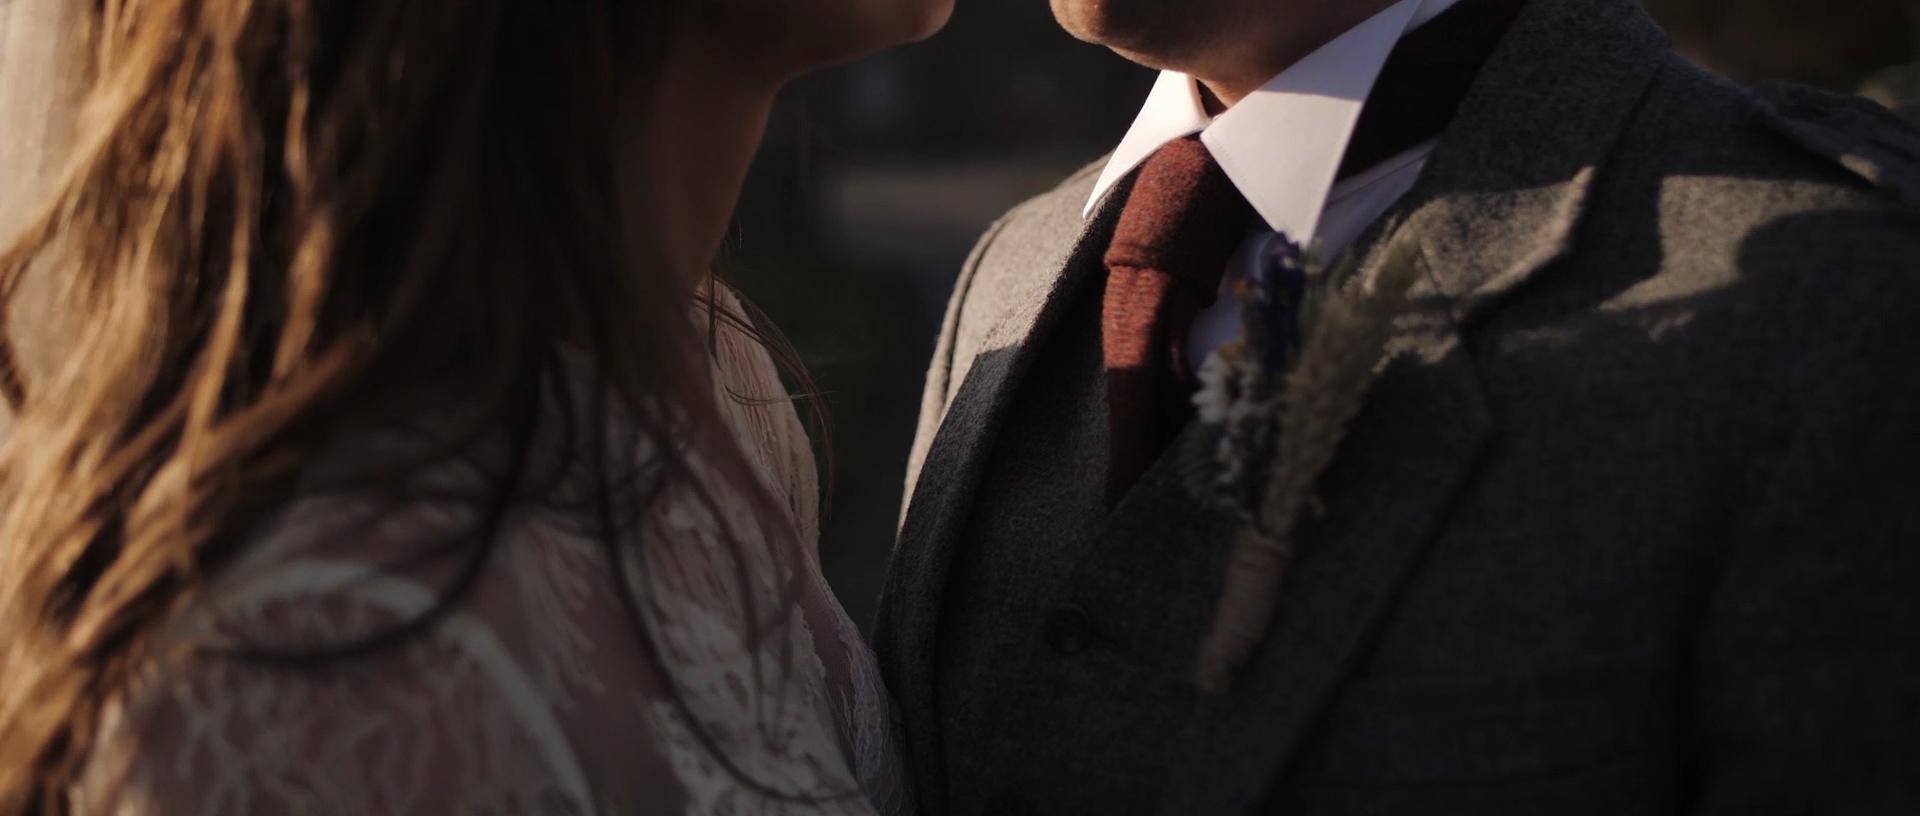 pratis-farm-wedding-videographer_LL_04.jpg